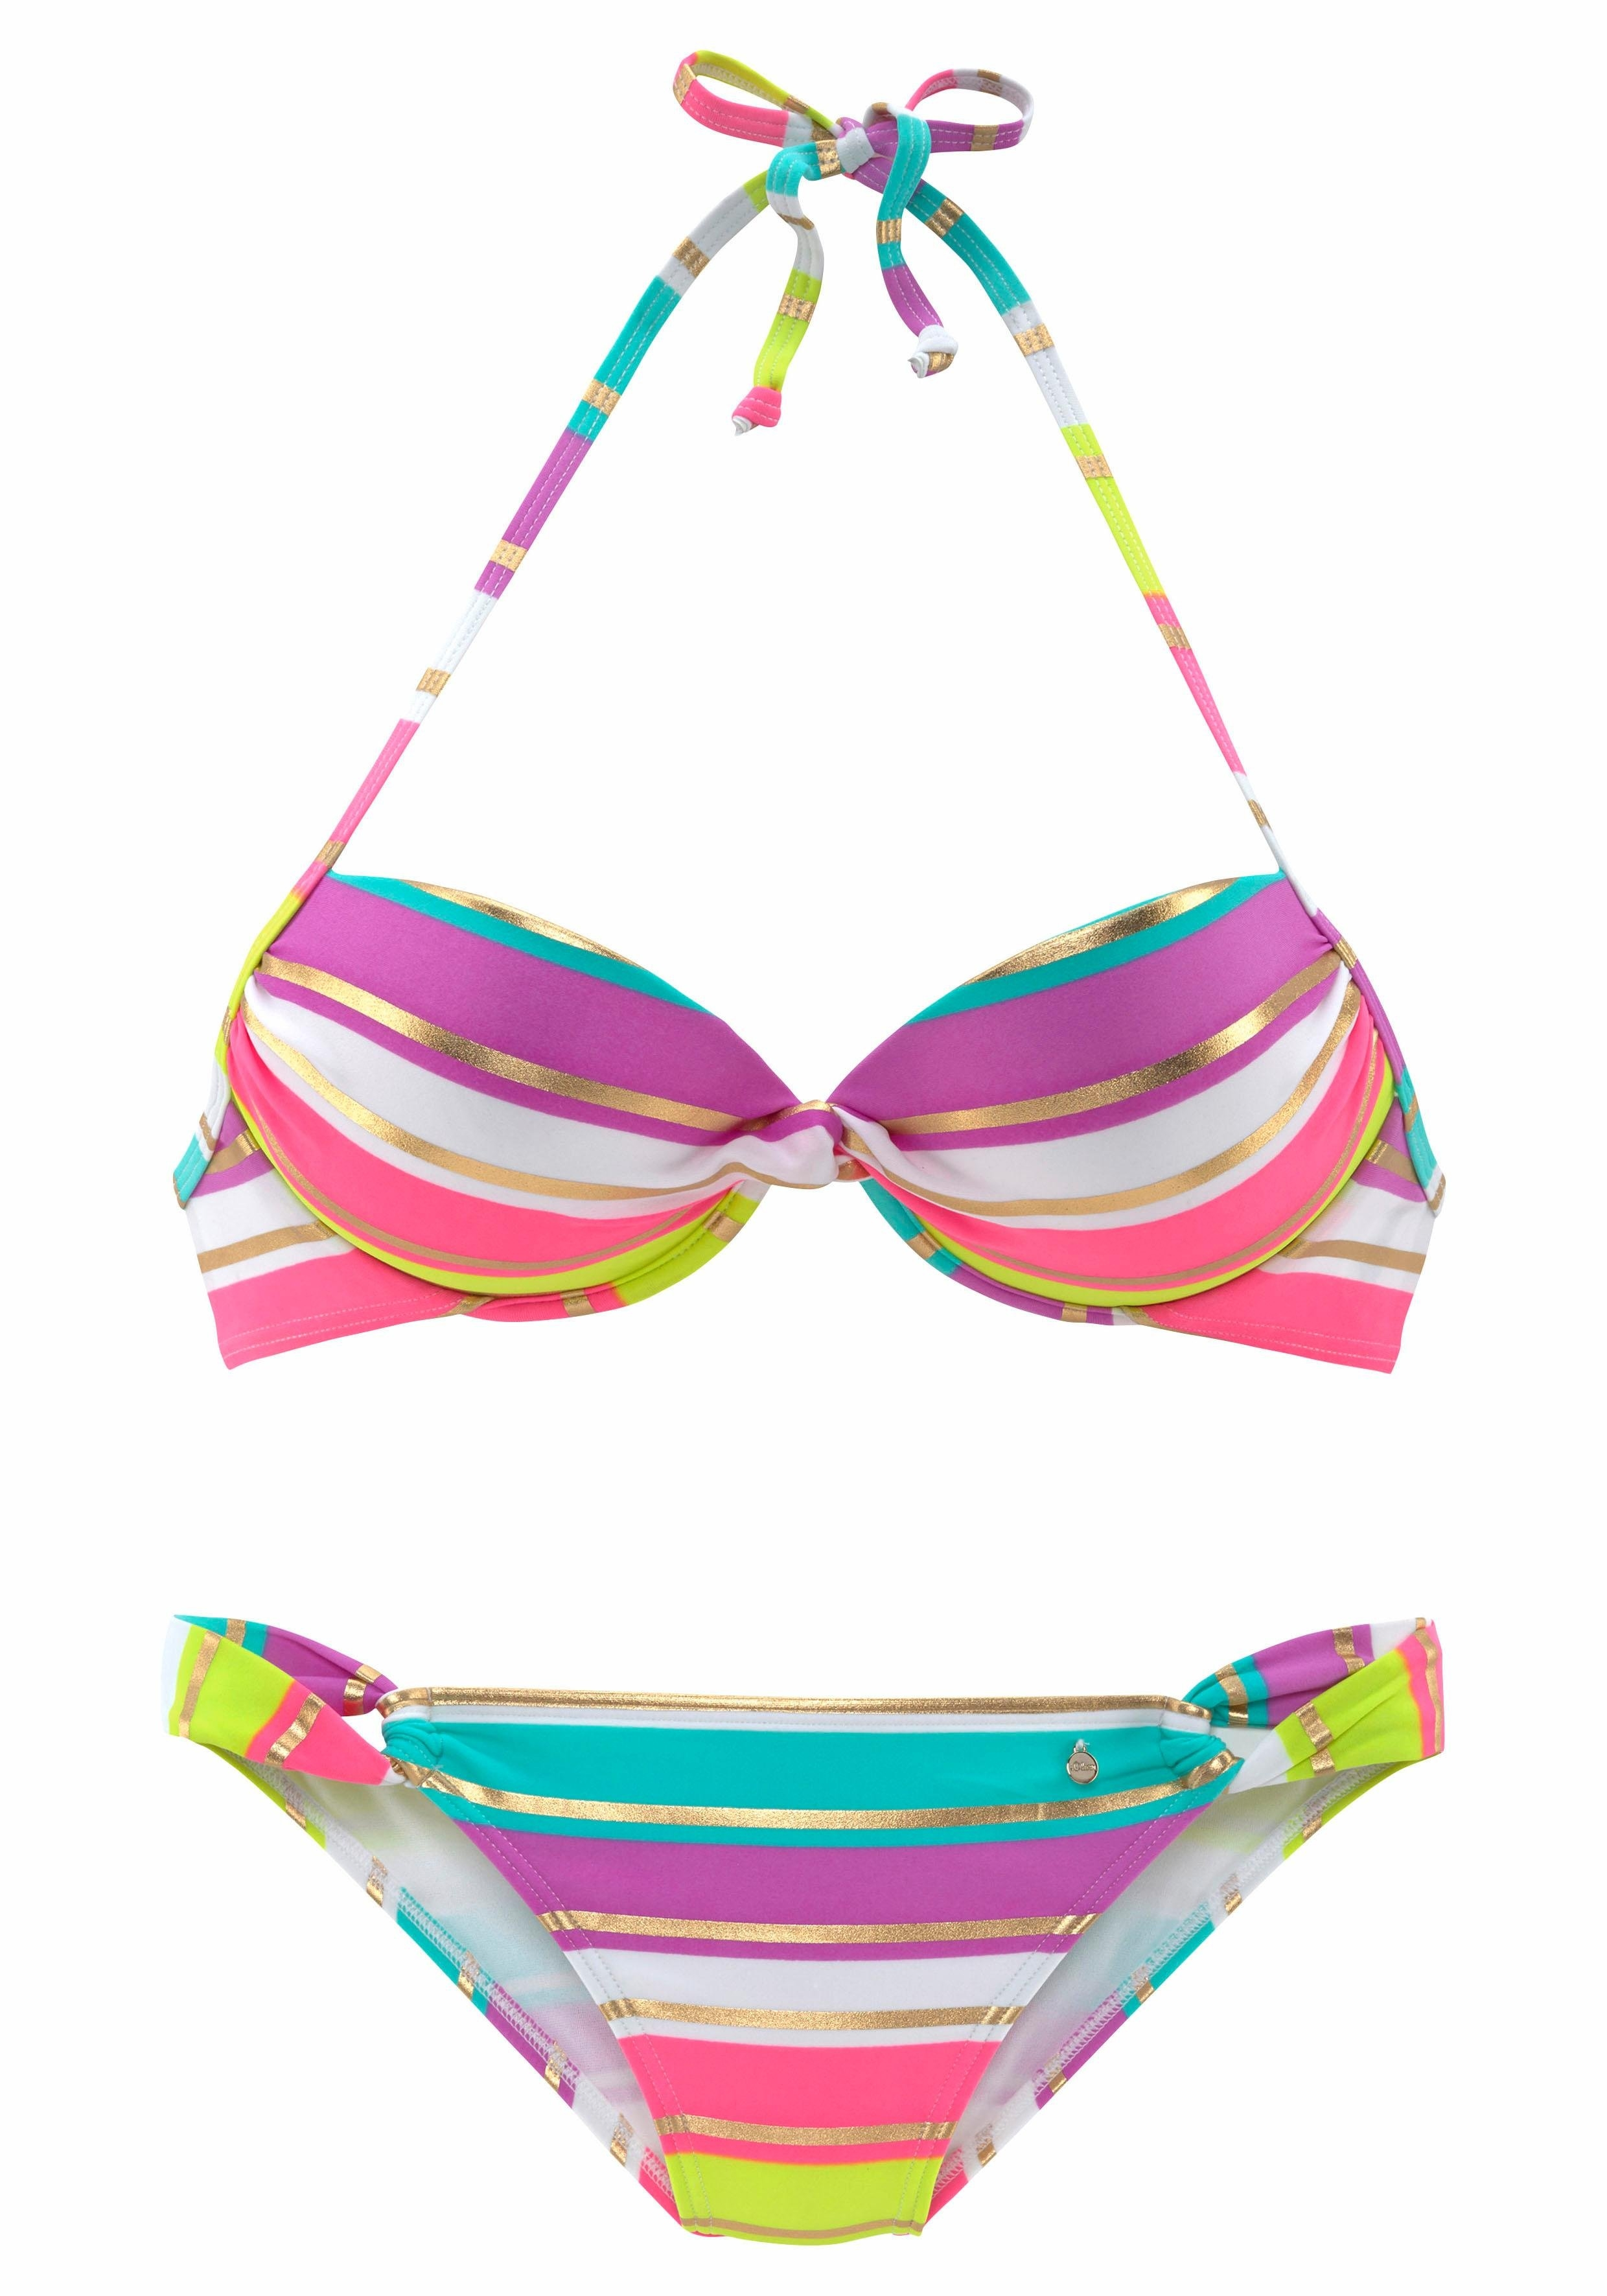 S bikini Met Cups2 oliver up Push Shop deligOnline Gewatteerde yvO8wNmn0